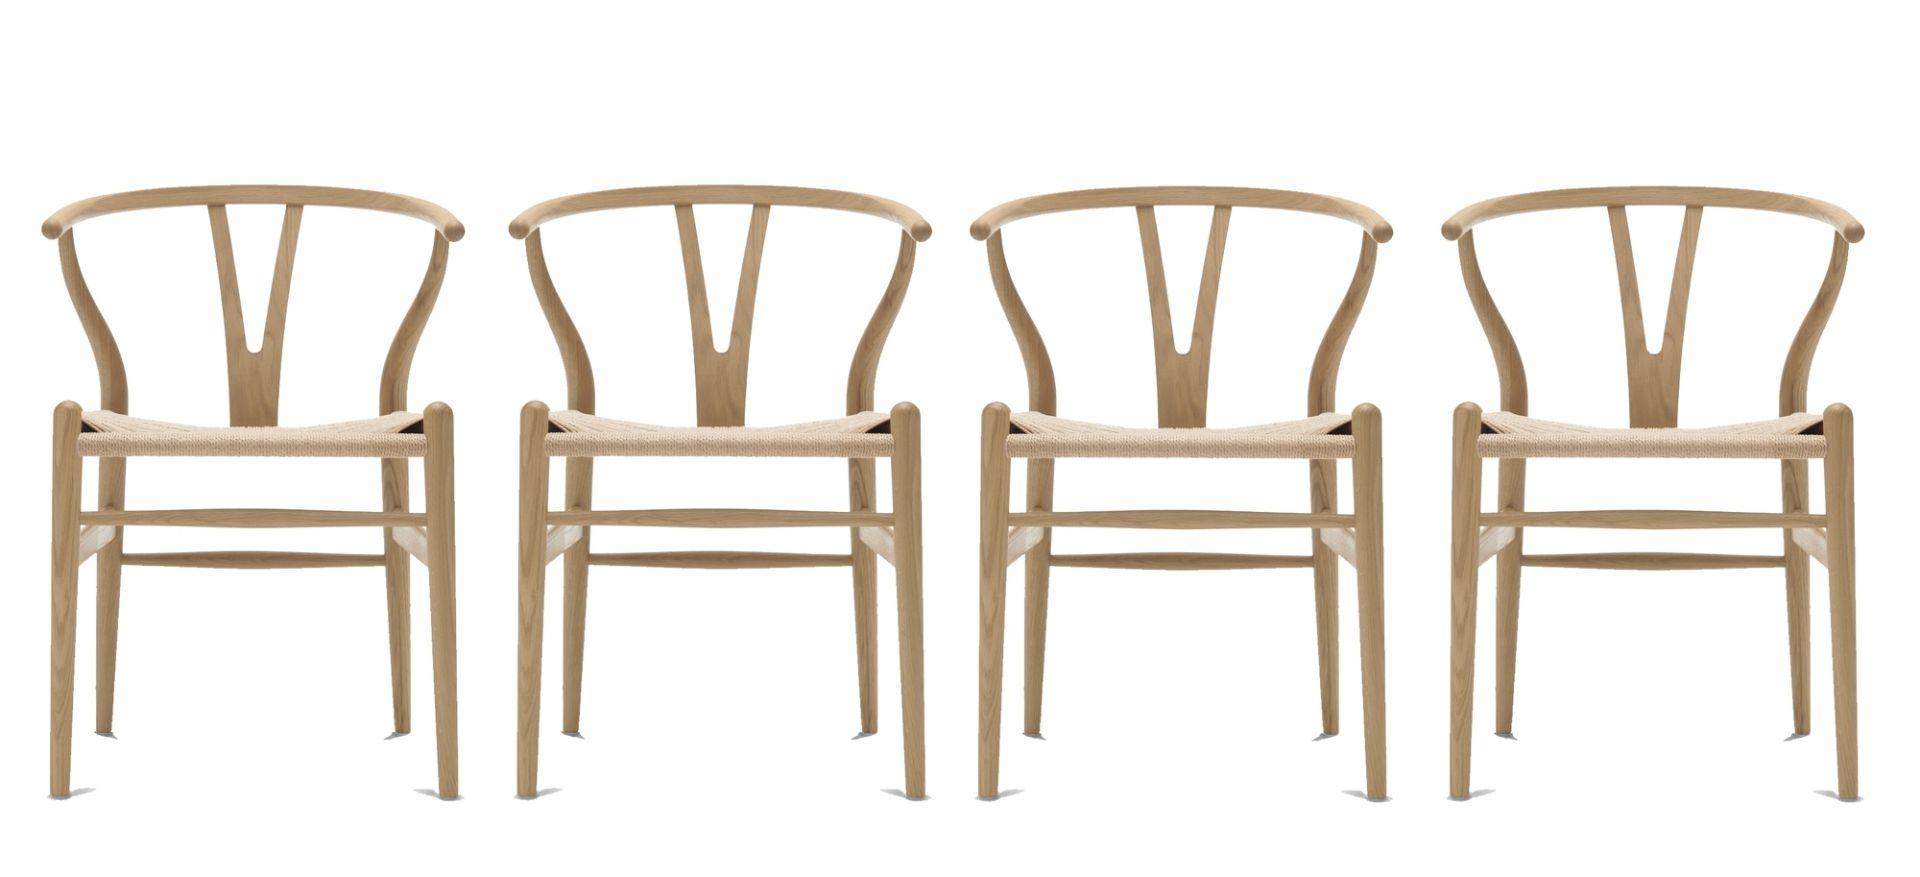 CH24 Wishbone Chair / Y-Chair Stuhl Eiche geseift 4-er Set Carl Hansen & Søn